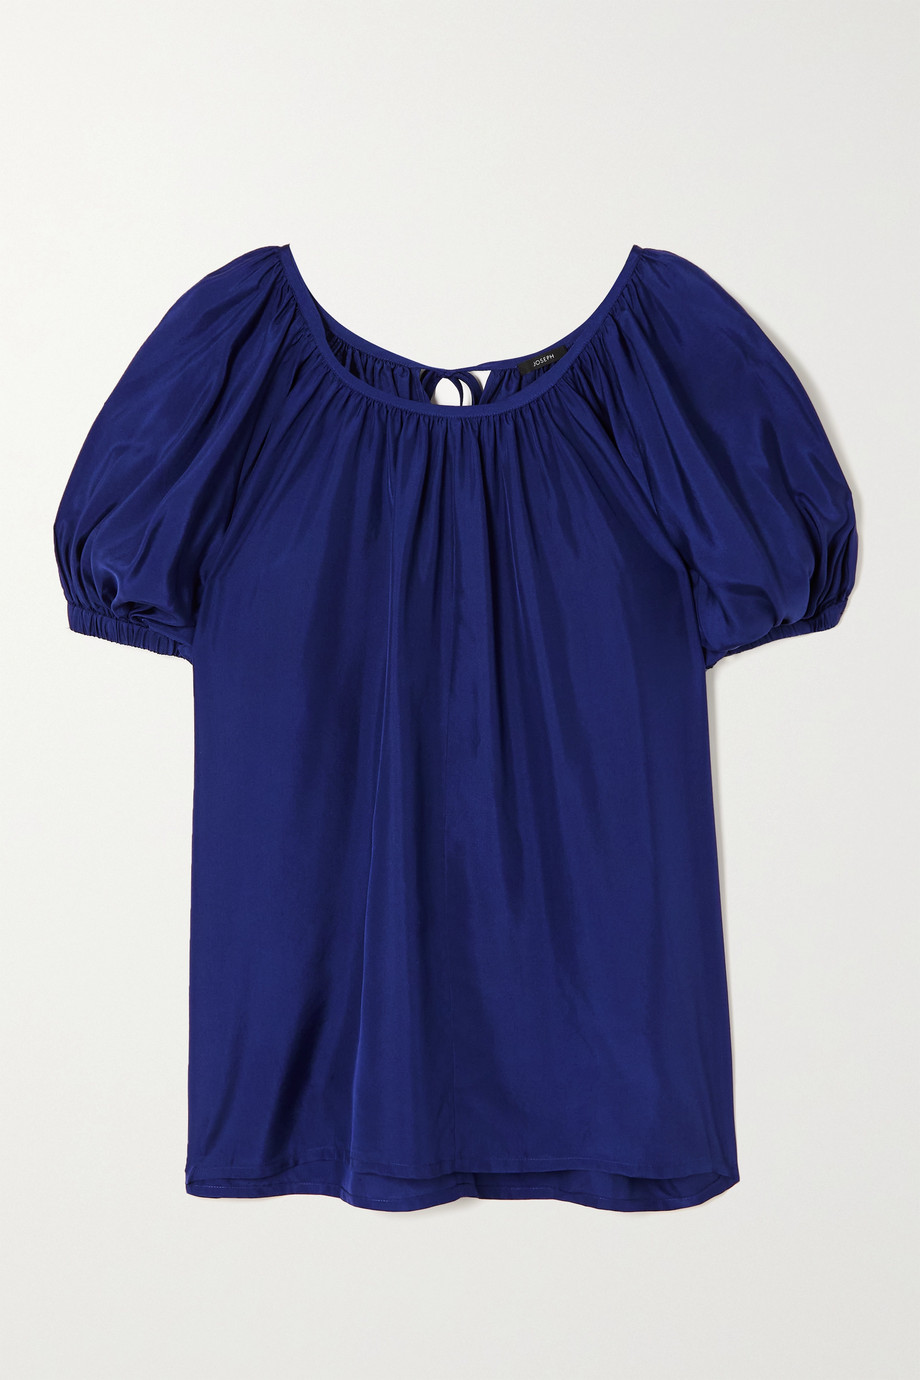 Joseph Baidy gathered silk-habotai blouse